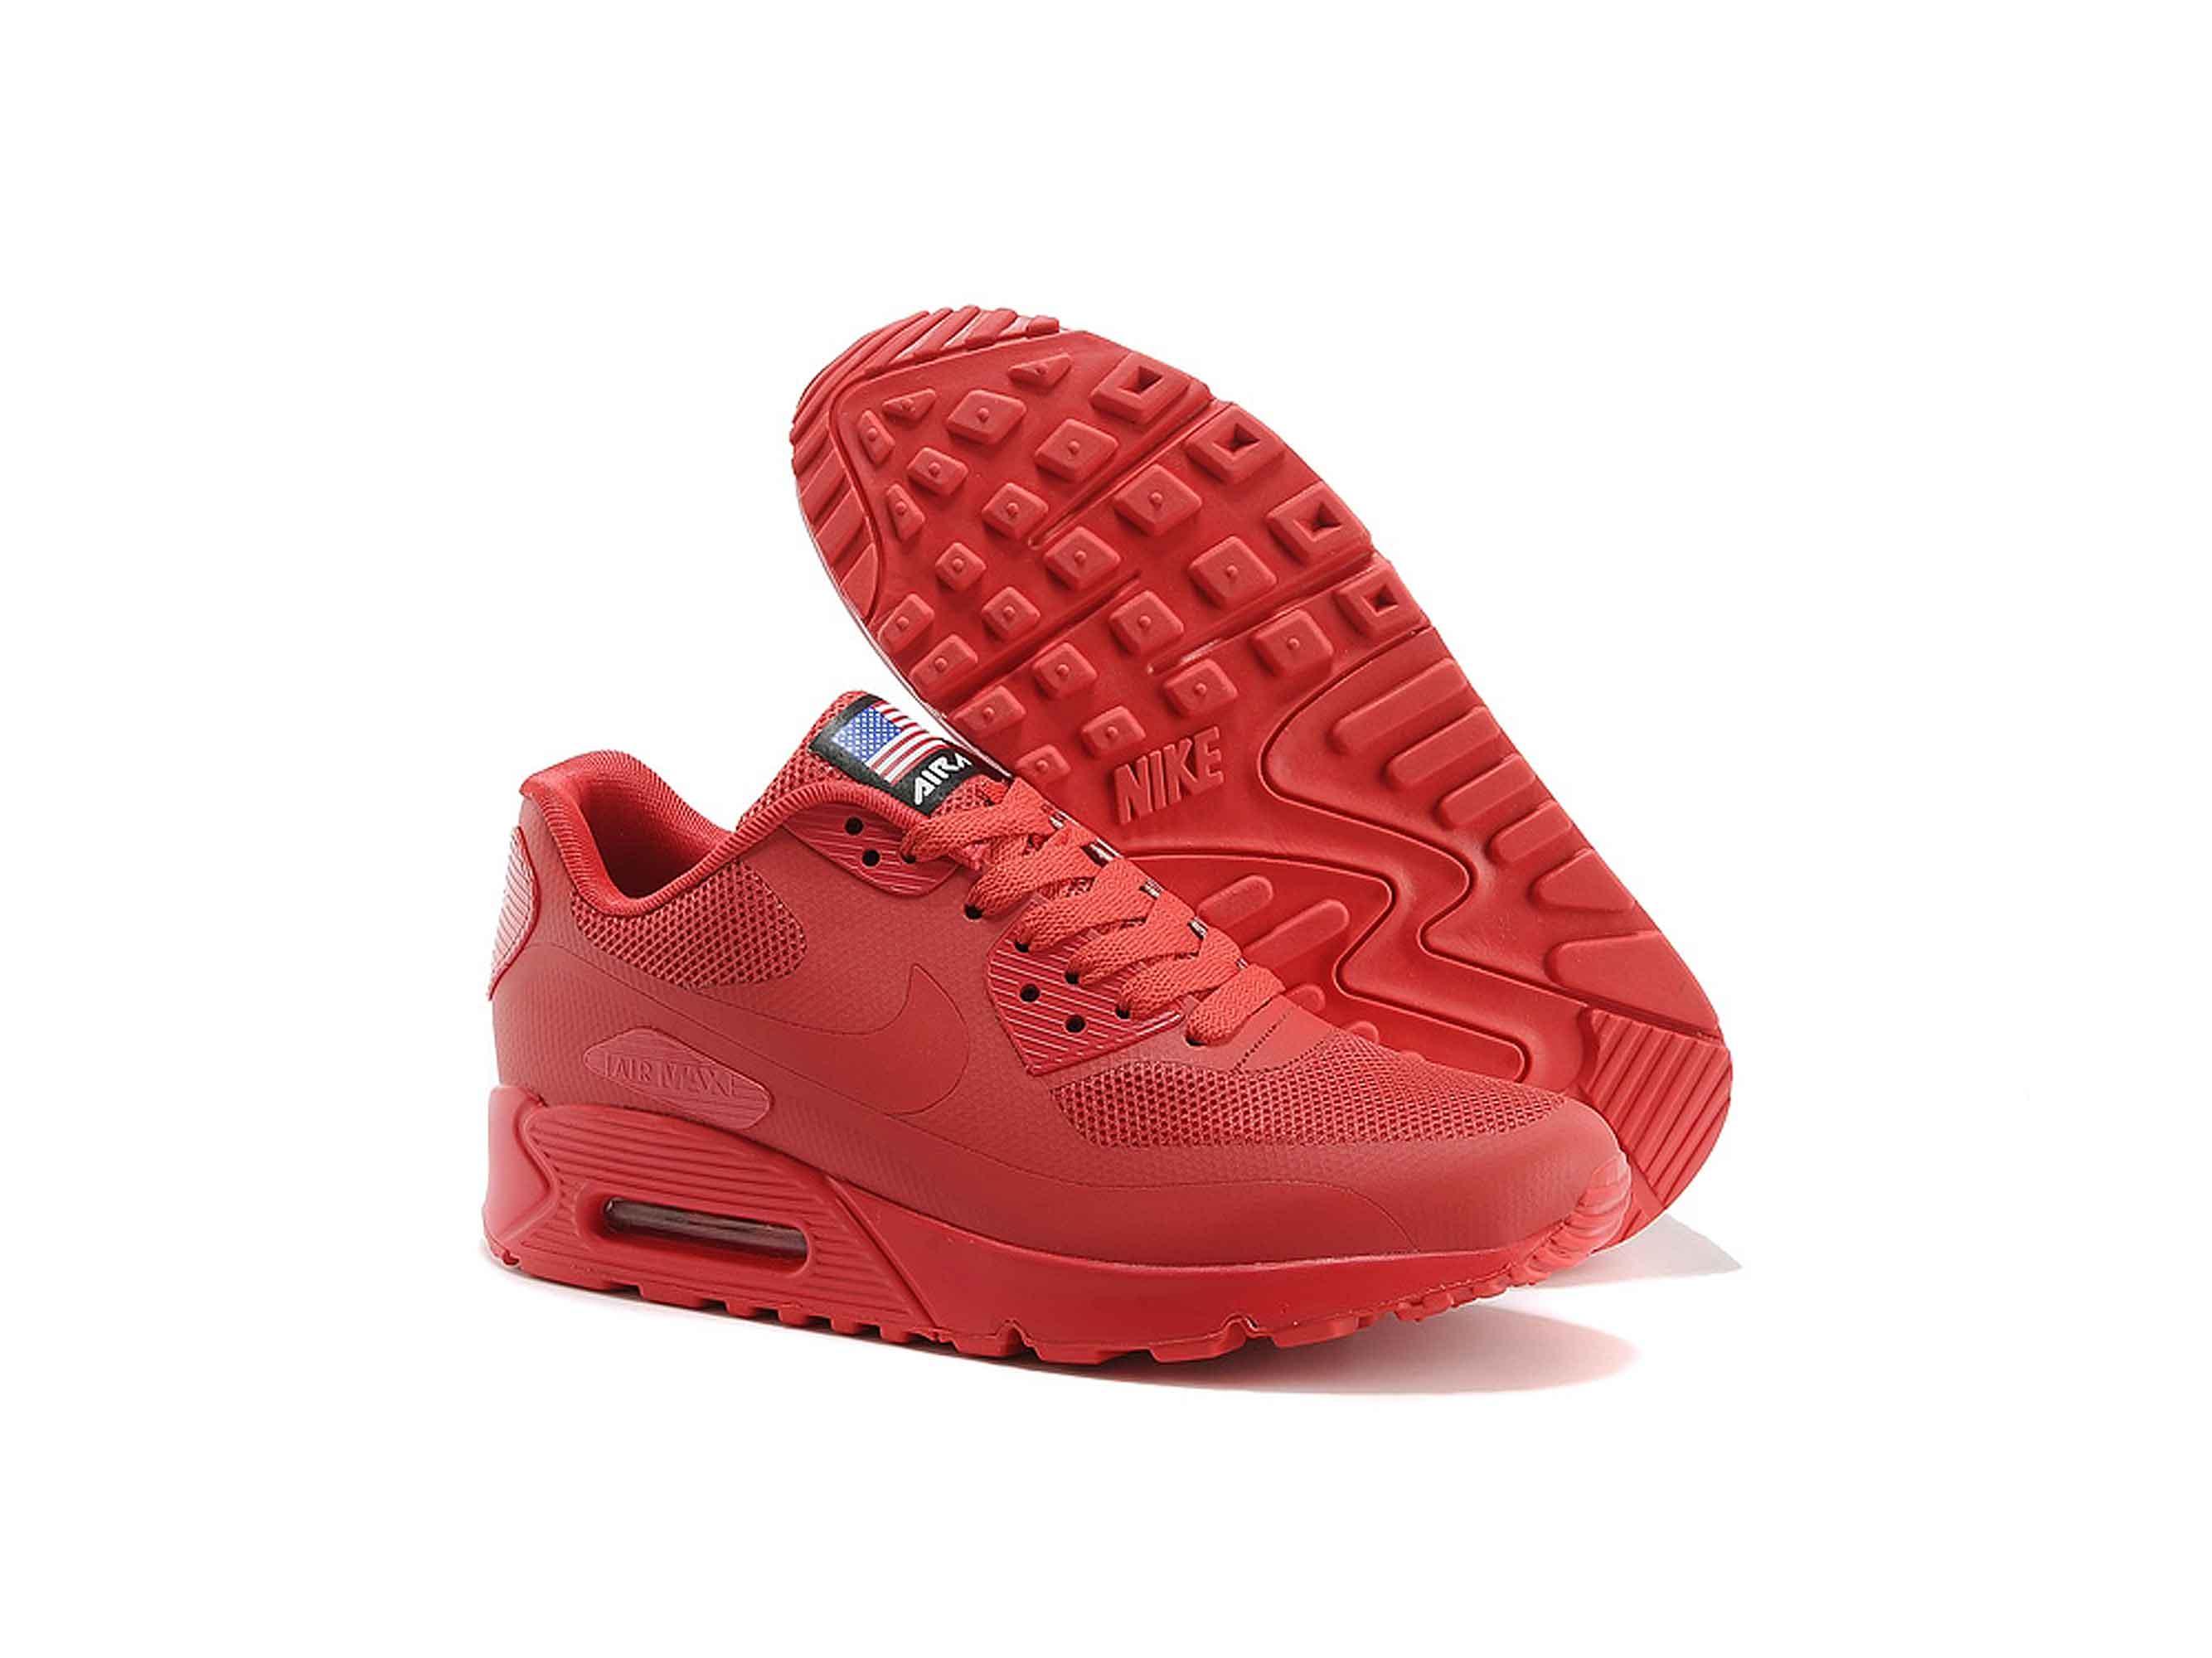 Nike air max 90 hyperfuse купить